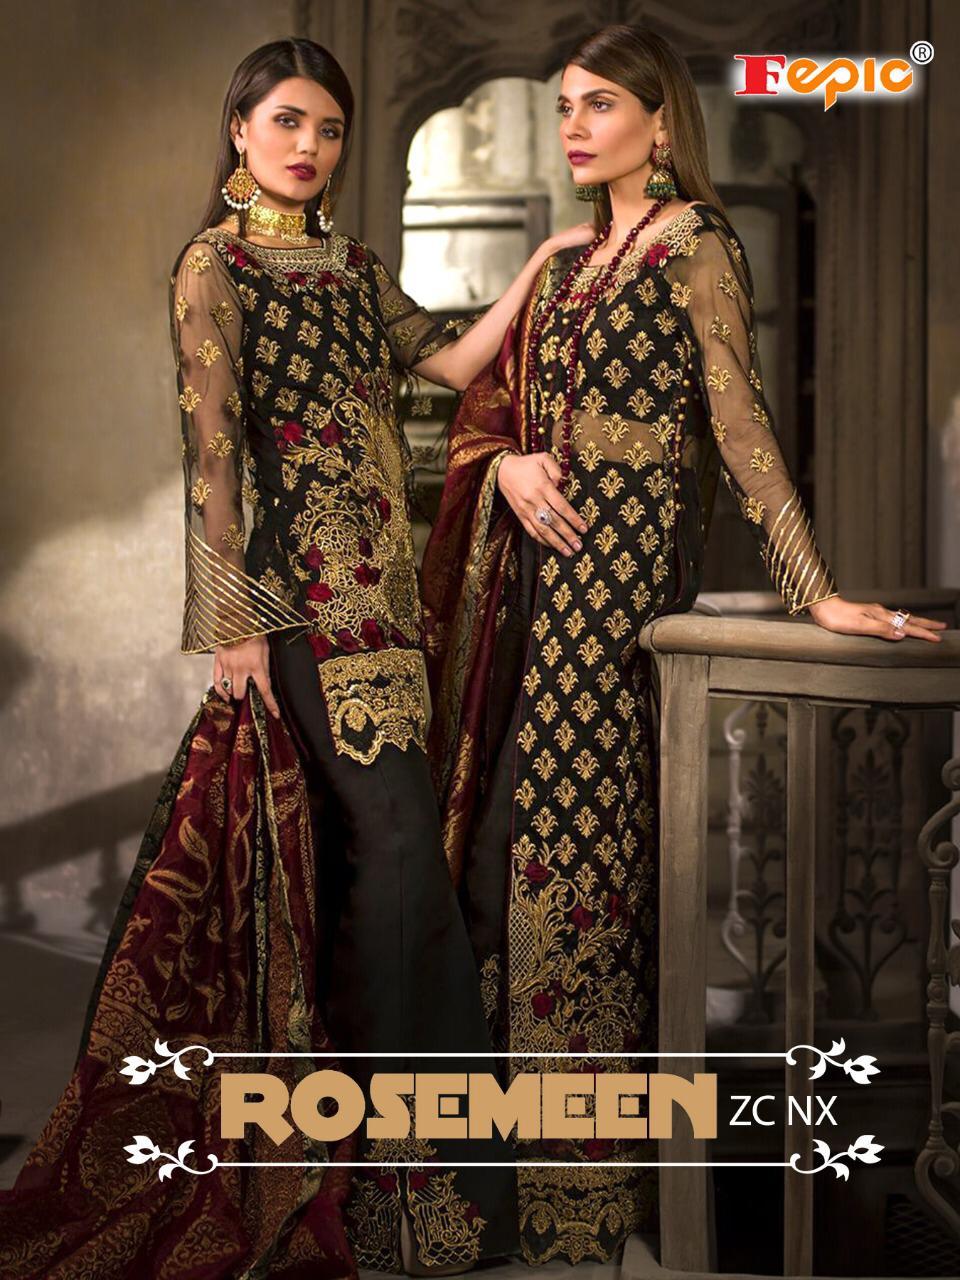 Fepic Rosmeen Zc Nx Designer Pakistani Suits Wholesale